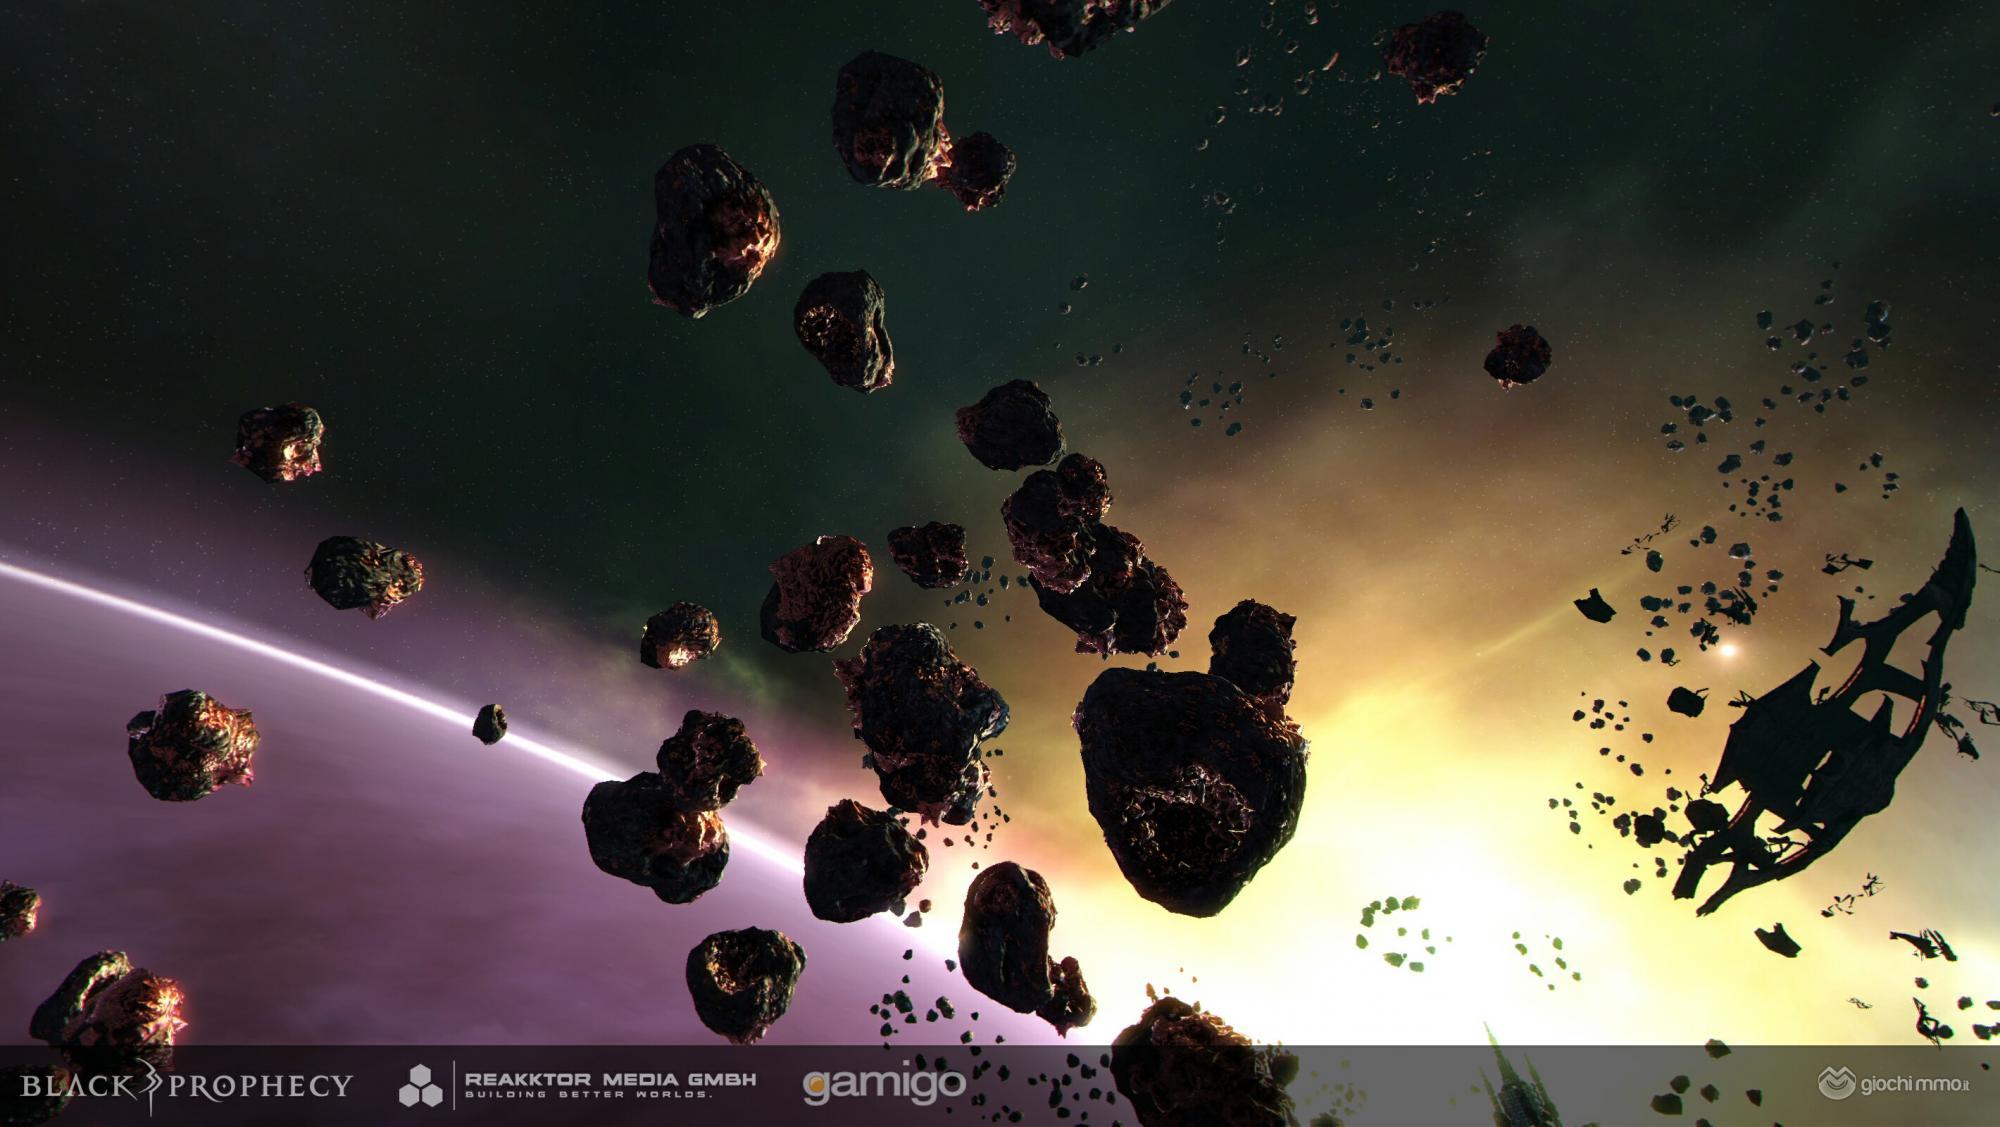 Clicca sull'immagine per ingrandirlaNome:   Black Prophecy Screen5.jpgVisite: 38Dimensione:   179.7 KBID: 8434